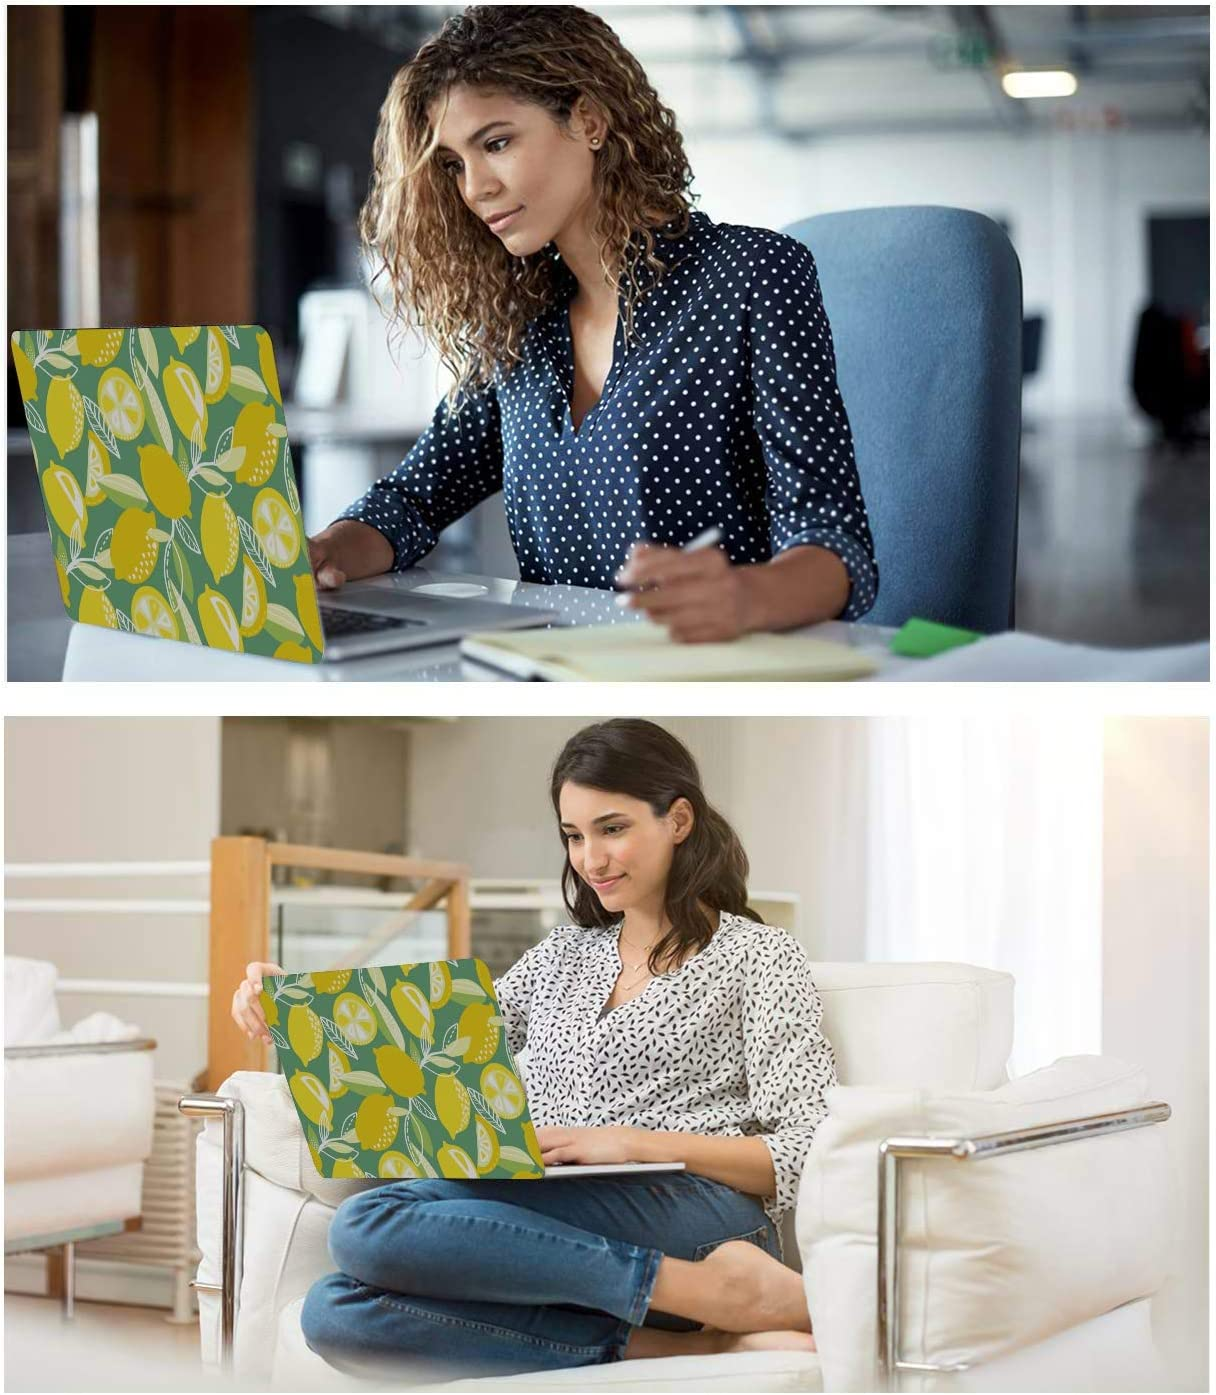 Mac Book Pro Cases Summer Sour Retro Cute Fruit Lemon Plastic Hard Shell Compatible Mac Air 11 Pro 13 15 MacBook Pro 13in Case Protection for MacBook 2016-2019 Version